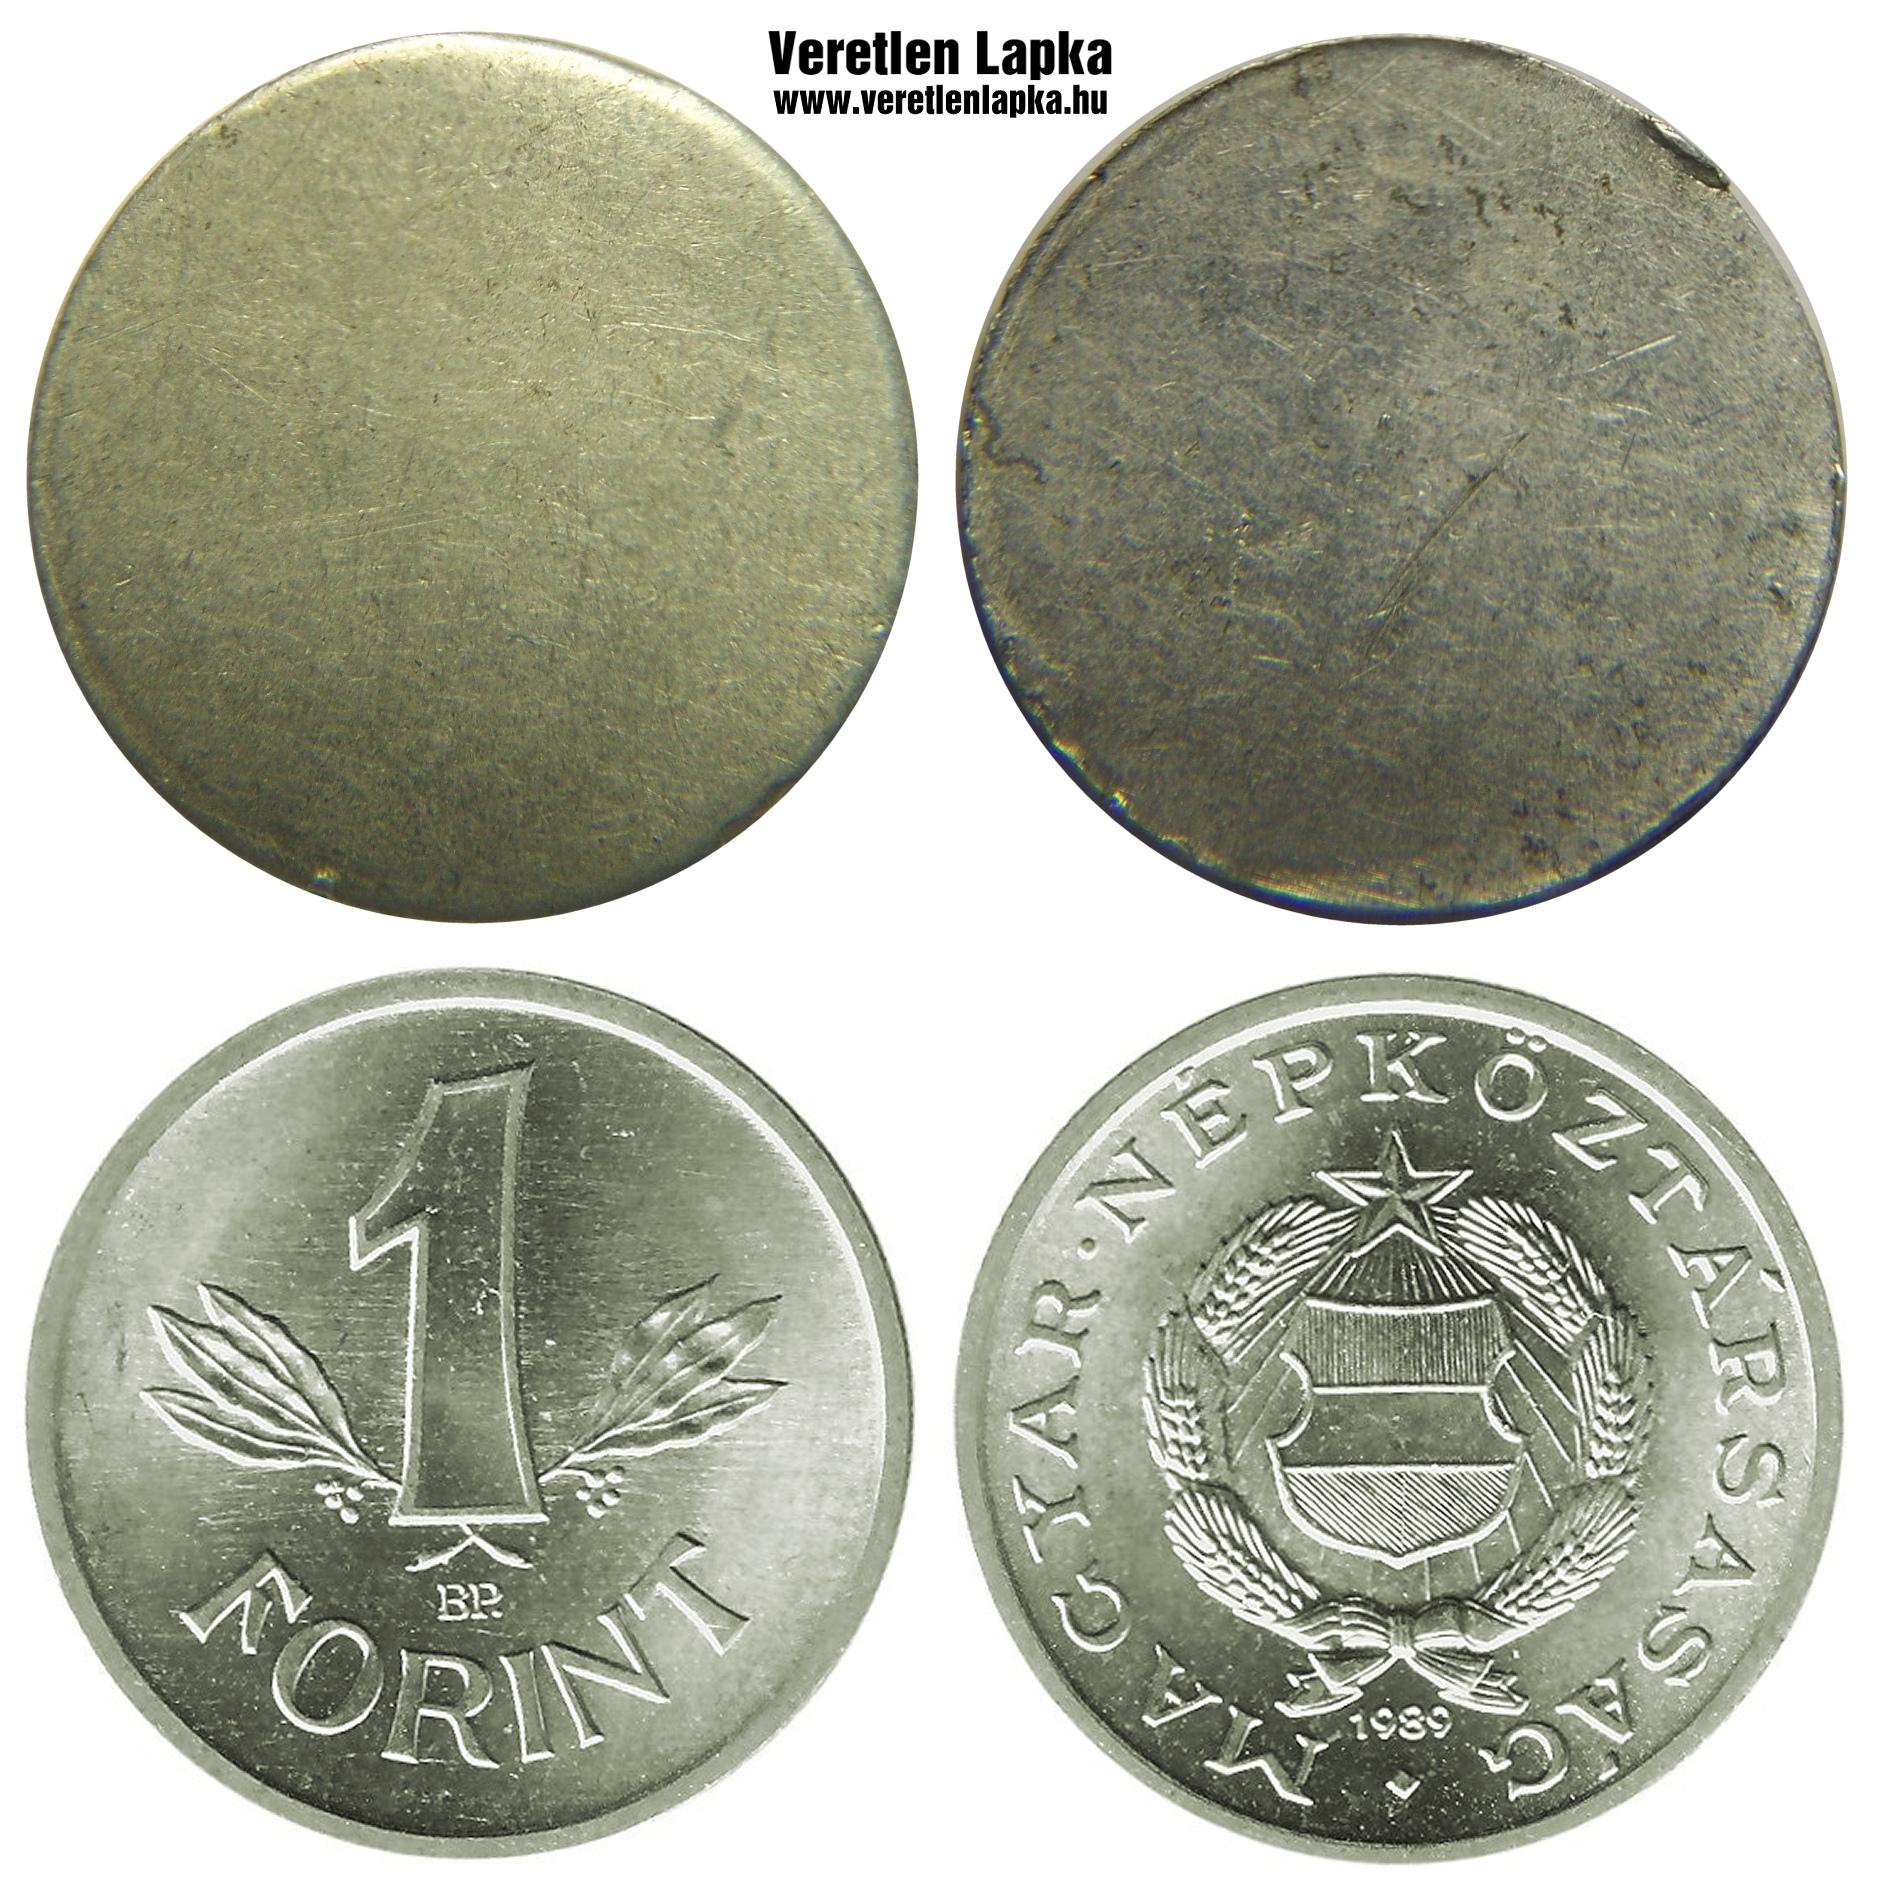 http://www.veretlenlapka.hu/veretlenlapkak/forint/www_veretlenlapka_hu_1_forint_nyers-lapka_1967-1989.jpg